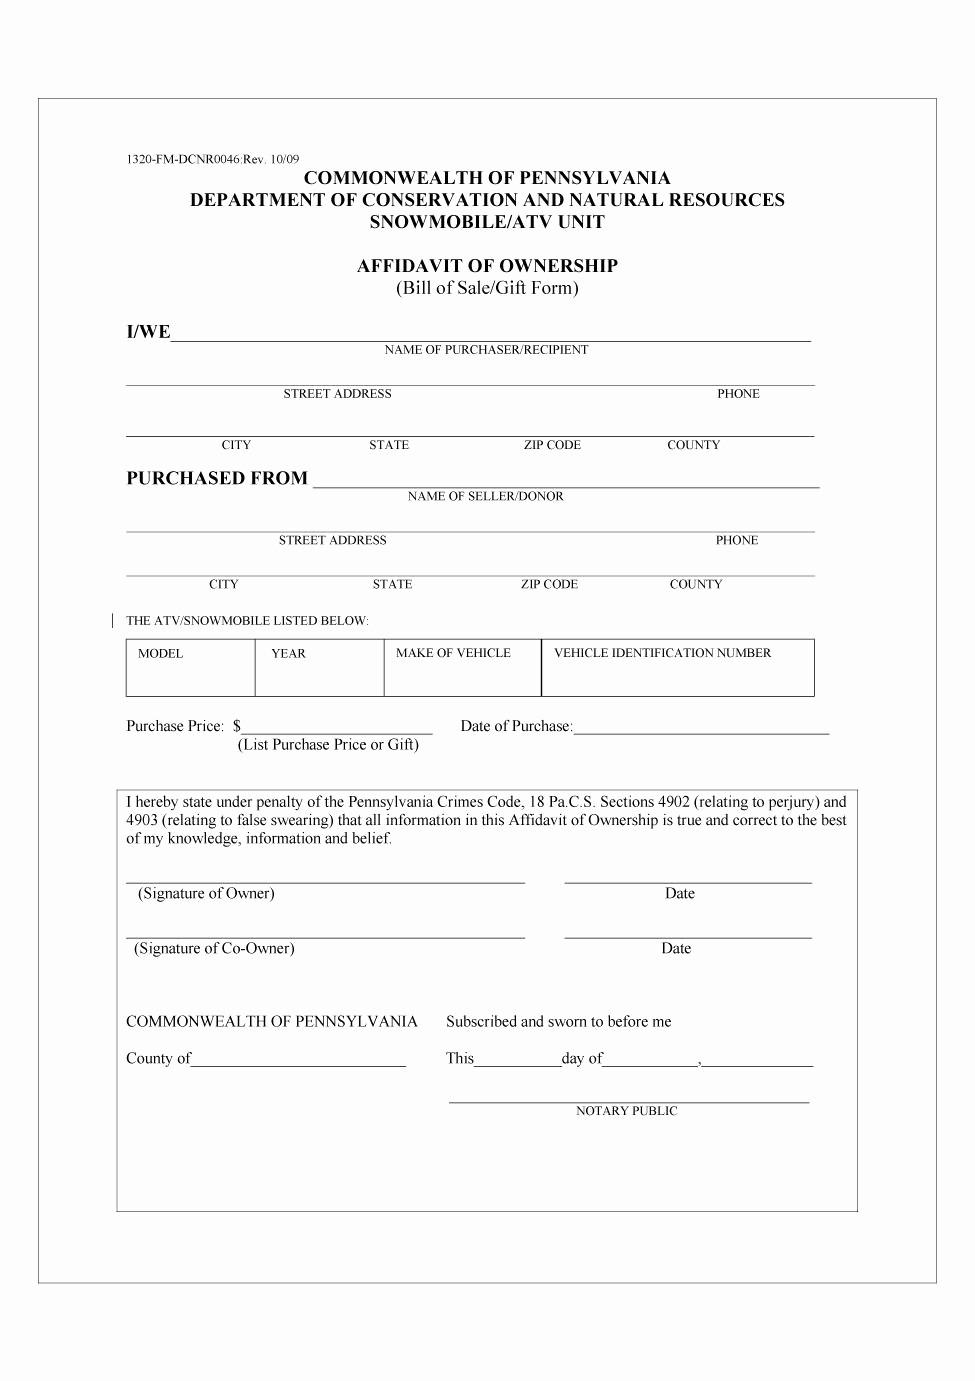 Free Bill Of Sale Templates Elegant 46 Fee Printable Bill Of Sale Templates Car Boat Gun